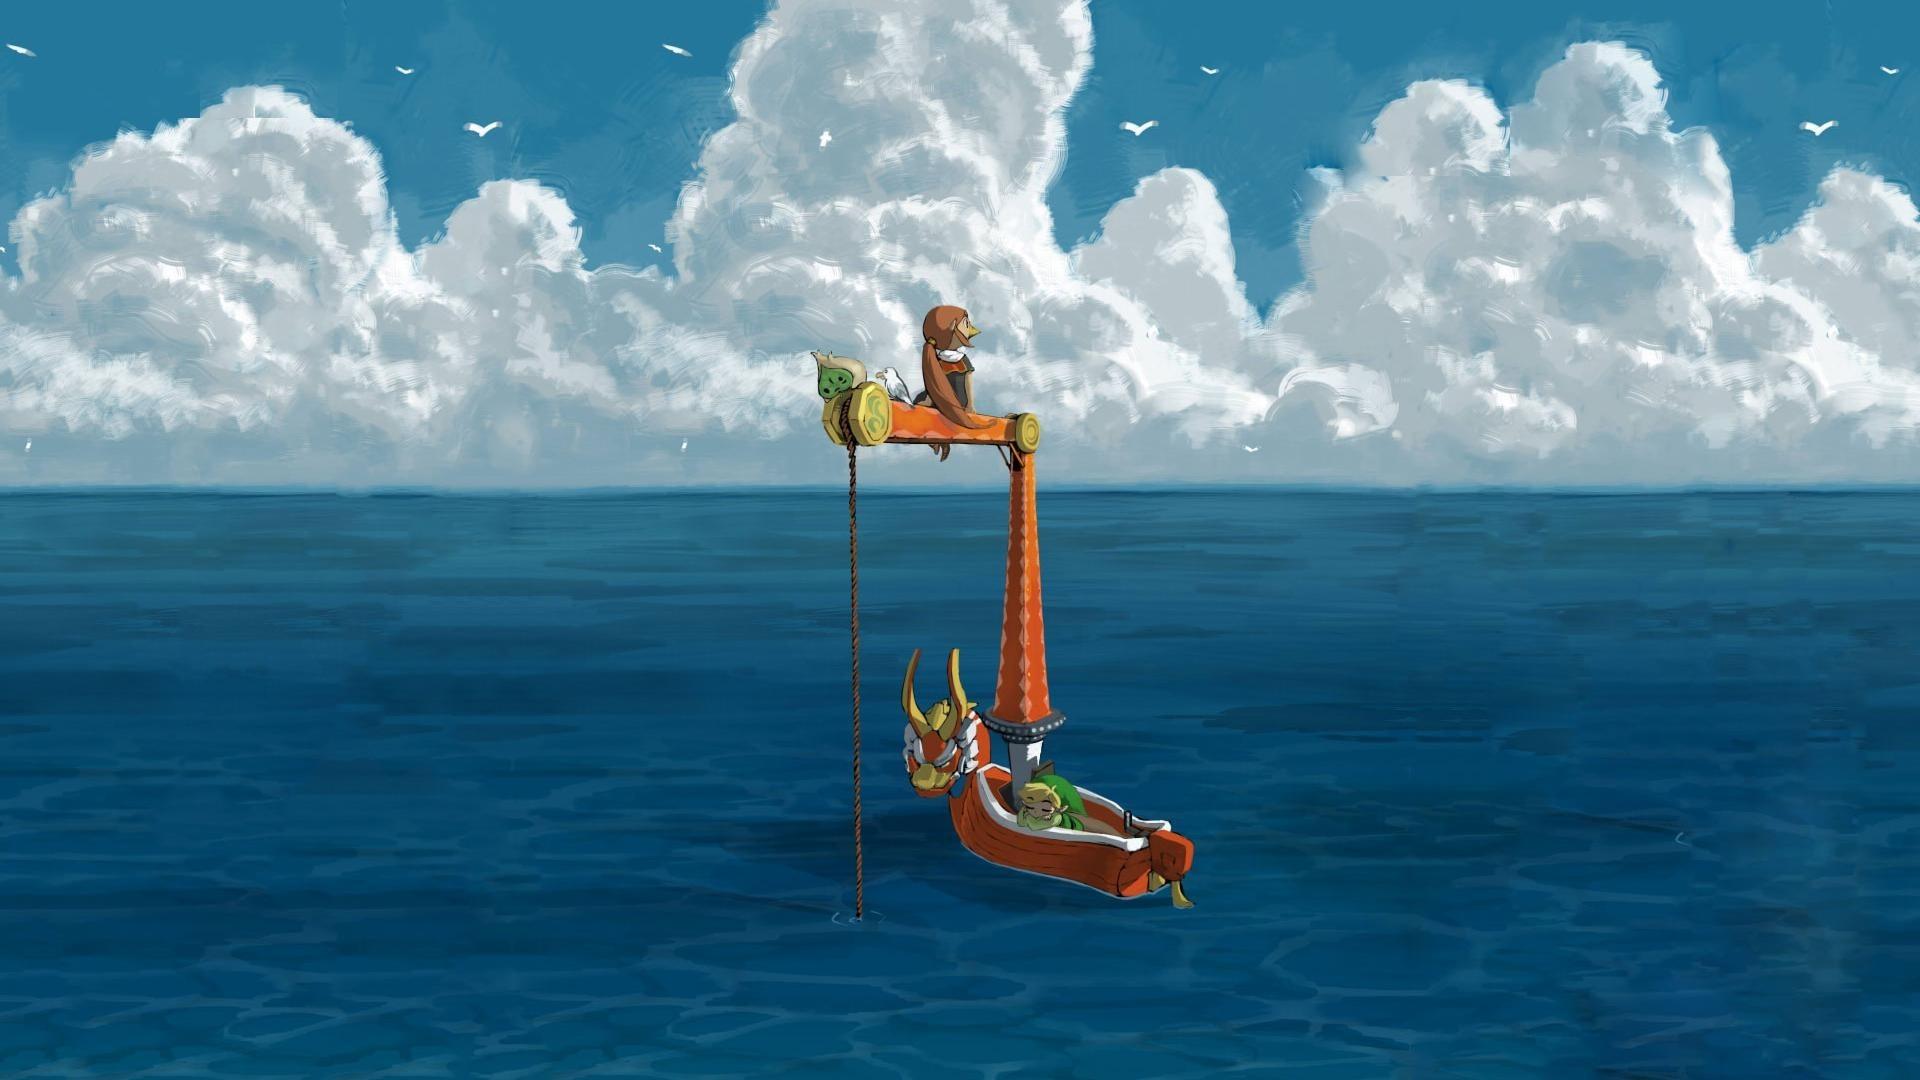 The Legend of Zelda, The Legend of Zelda: Wind Waker, Artwork, Video games Wallpapers  HD / Desktop and Mobile Backgrounds